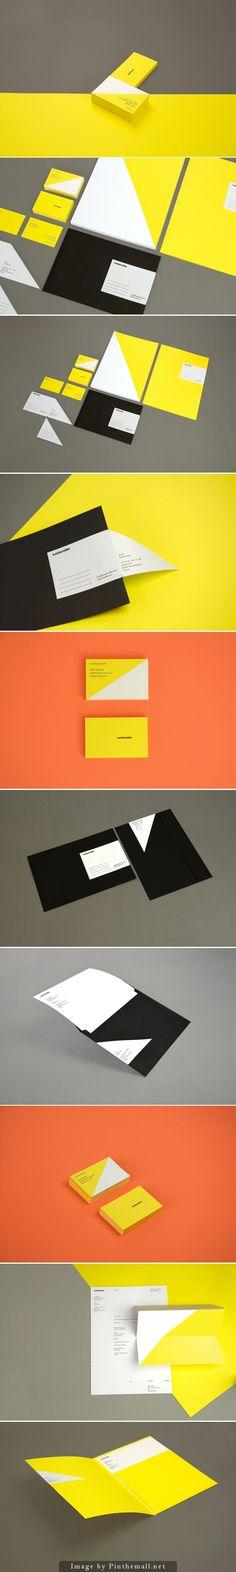 Studio Weidemüller branding